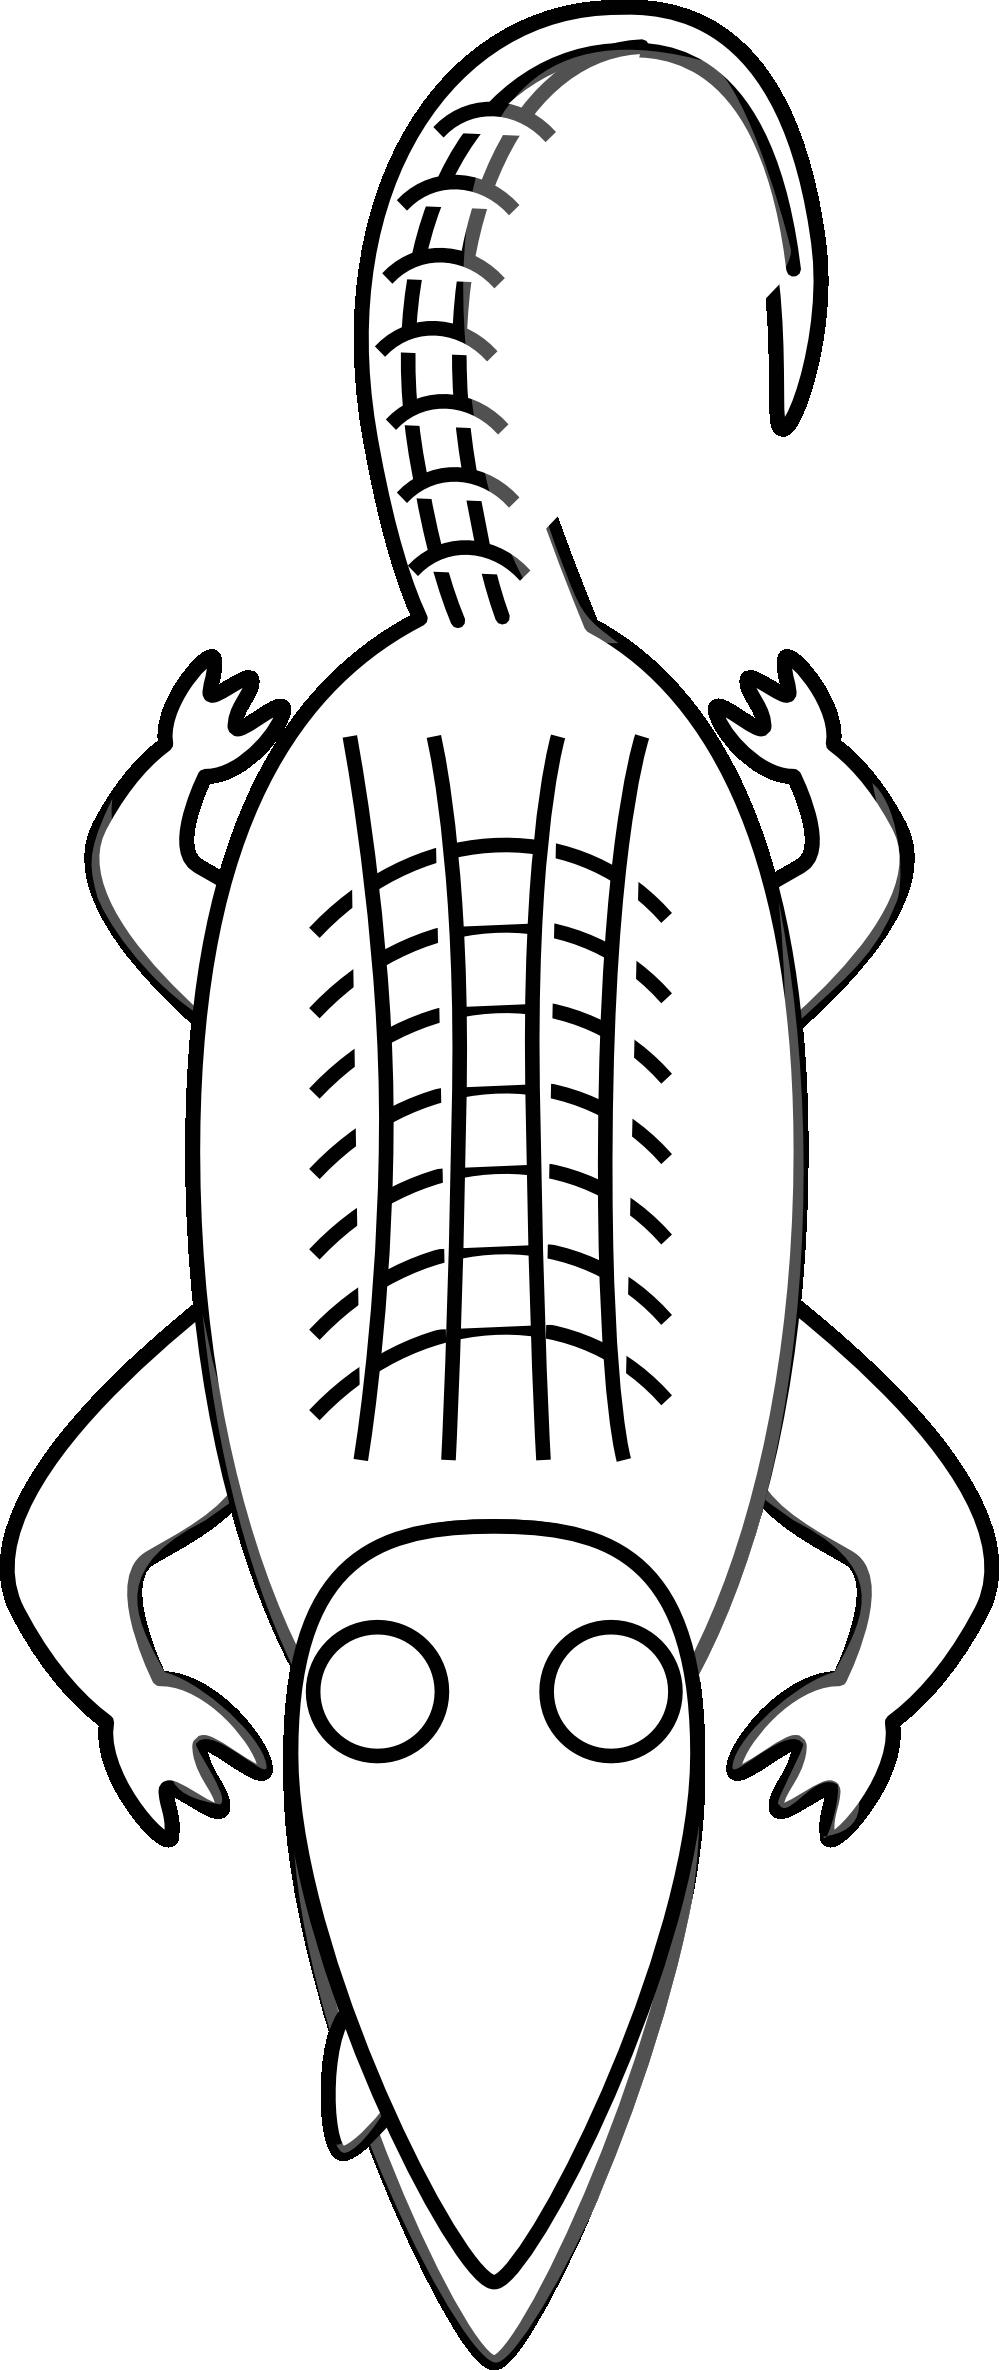 Crocodile Clipart Black And White | Clipart Panda - Free Clipart ... for Clipart Crocodile Black And White  113cpg